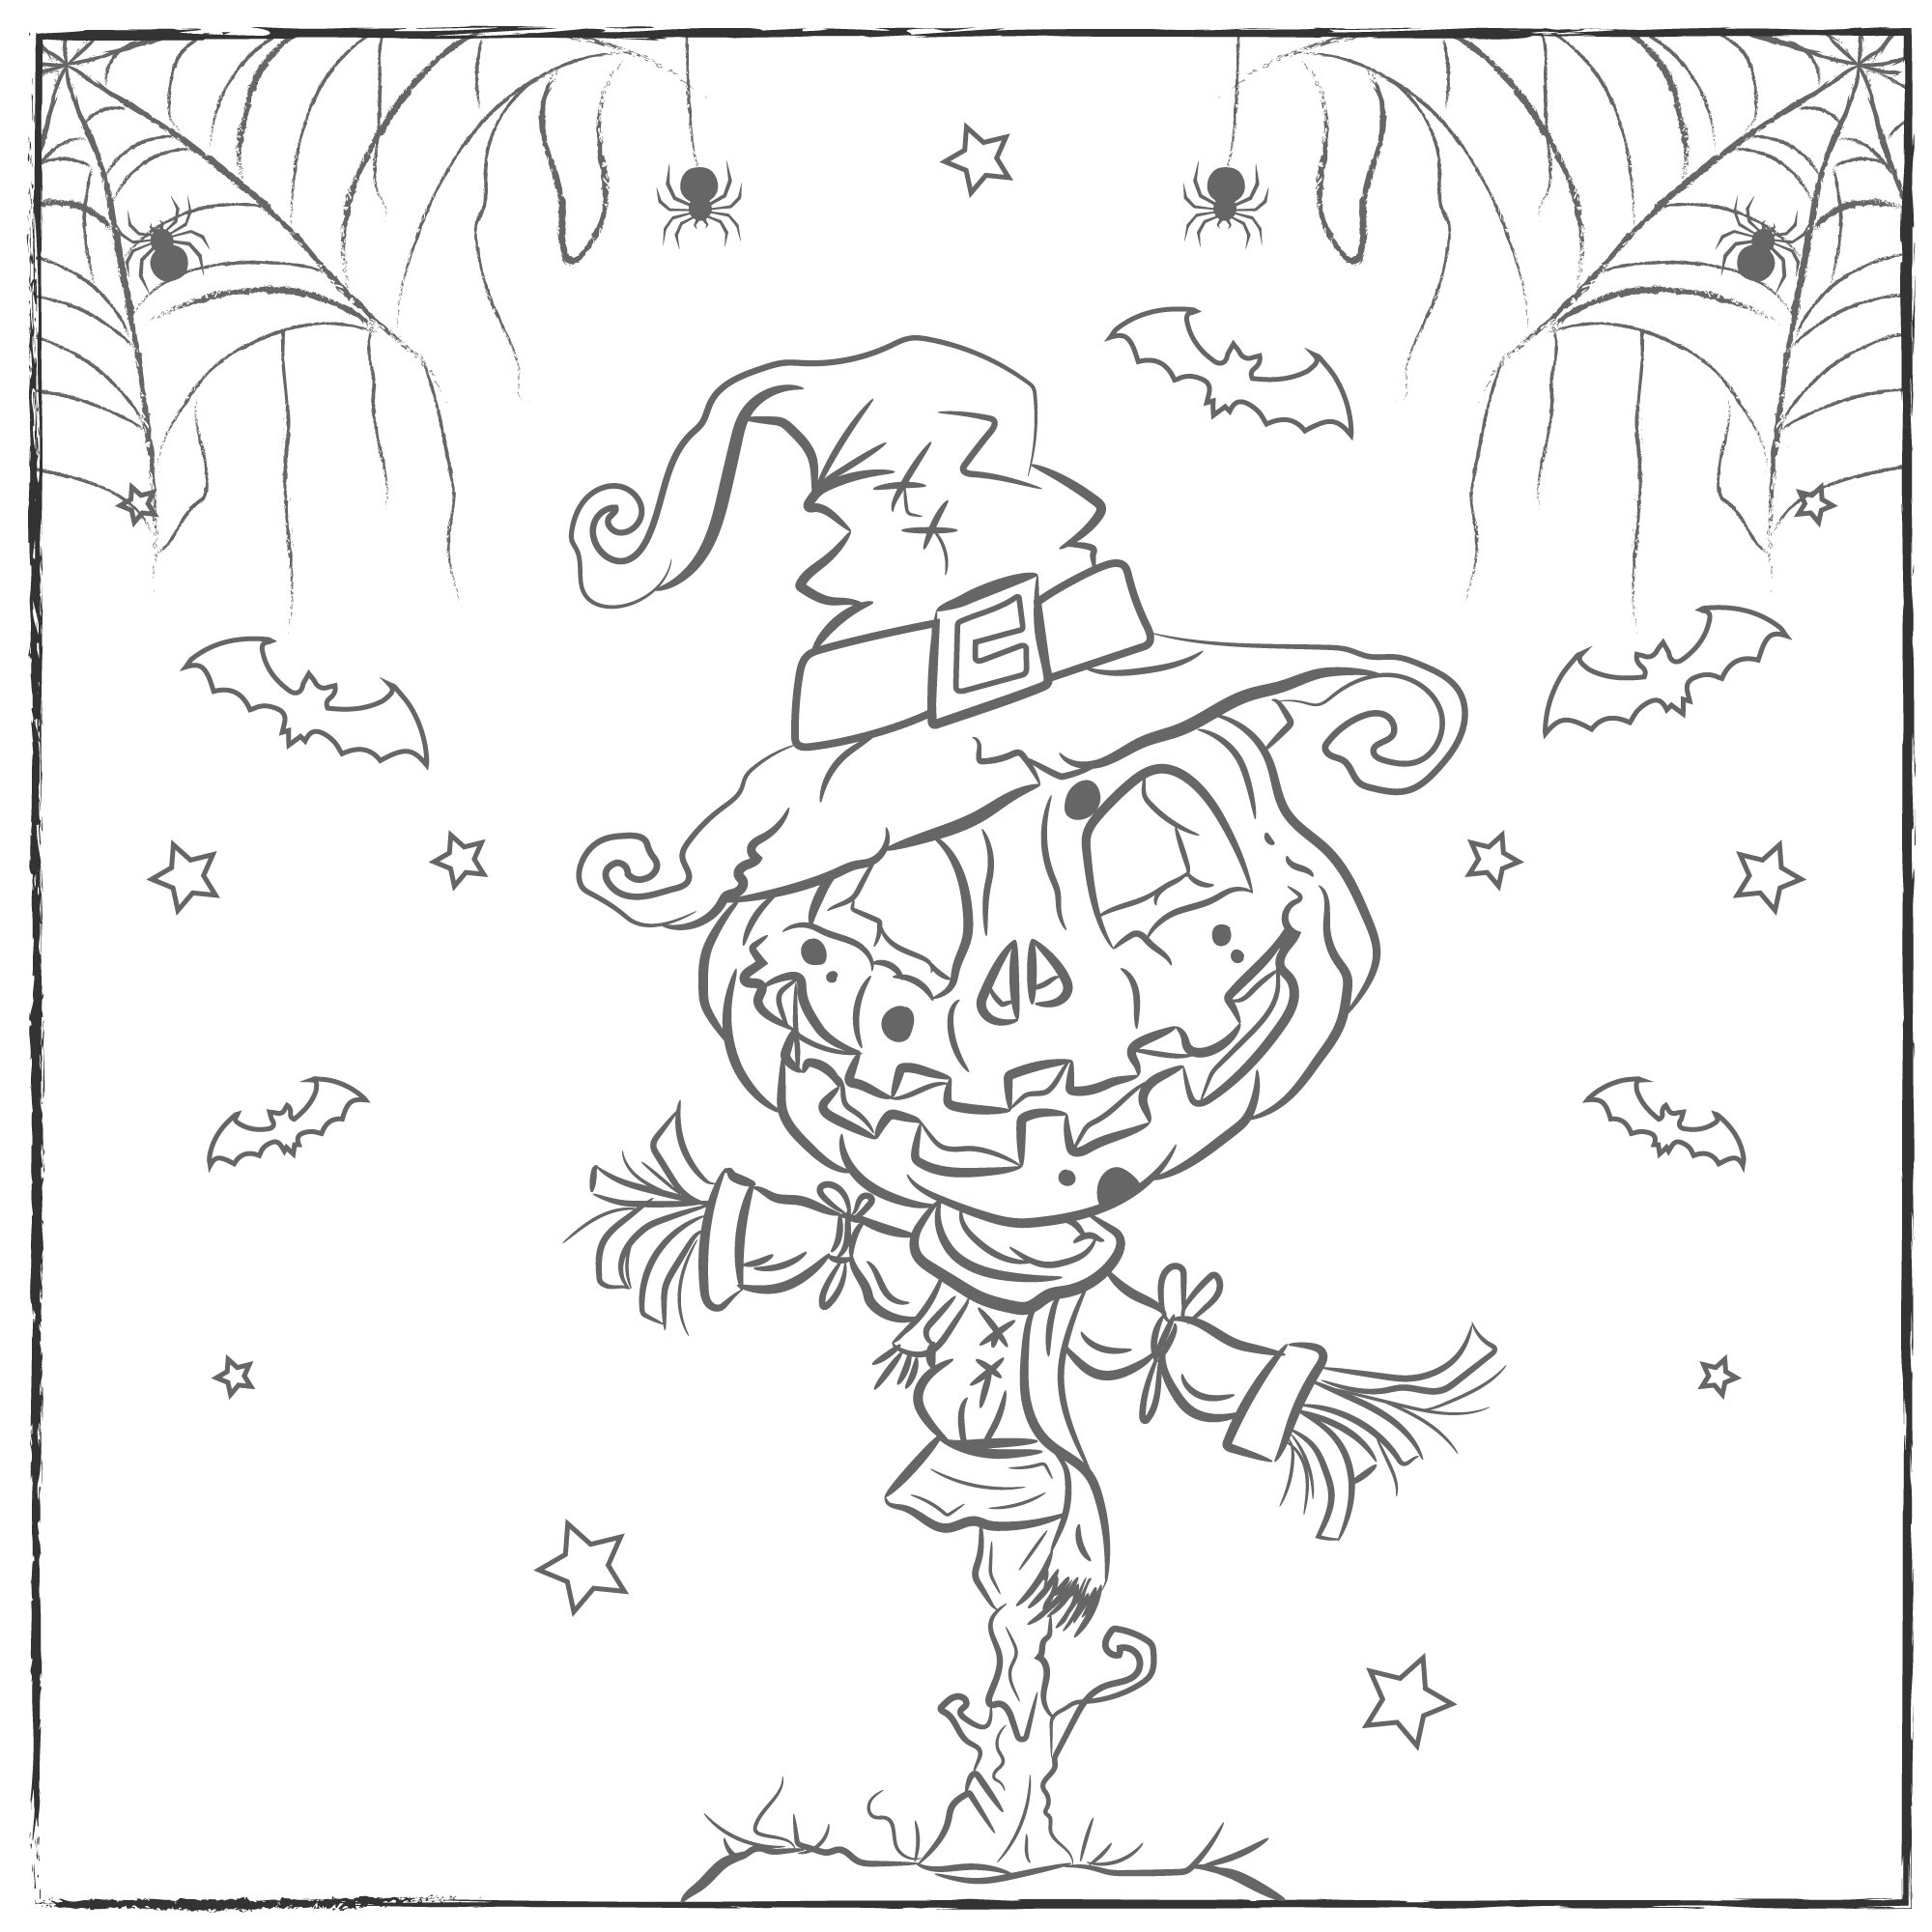 Halloween Pumpkin Scarecrow Coloring Page Download Free Vectors Clipart Graphics Vector Art